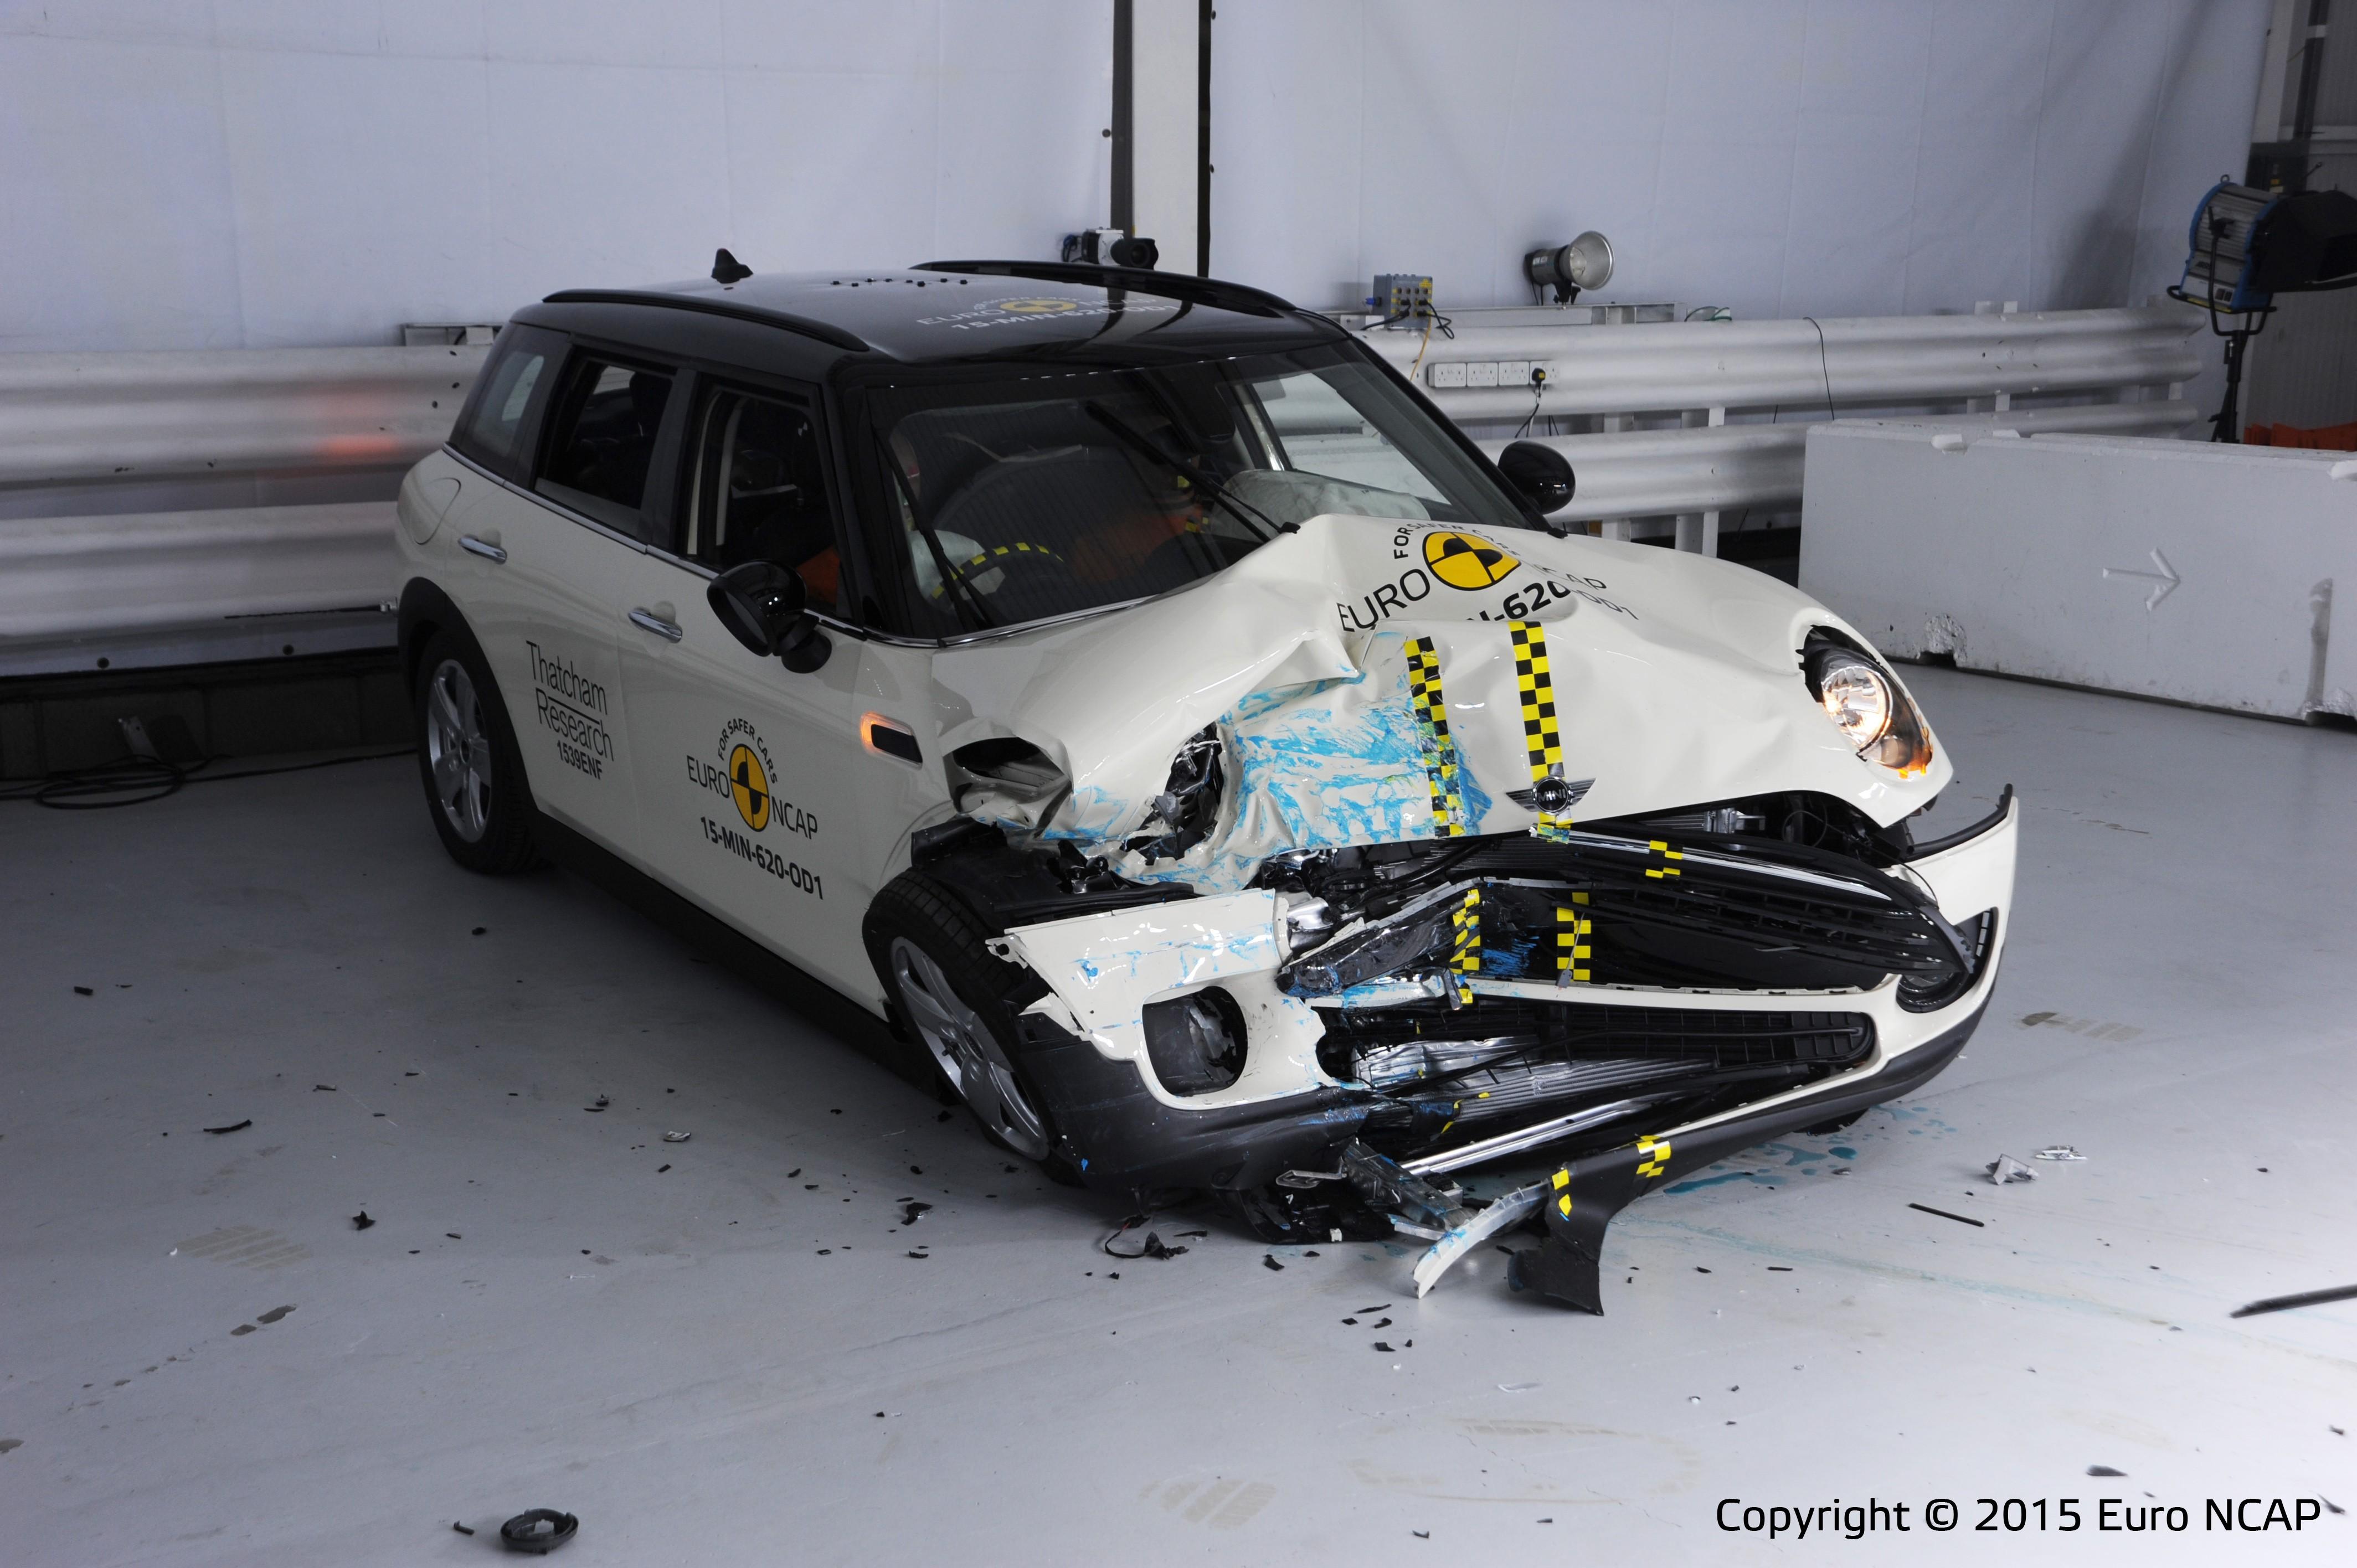 Latest Euroncap Test New Mini Clubman Falls Short With 4